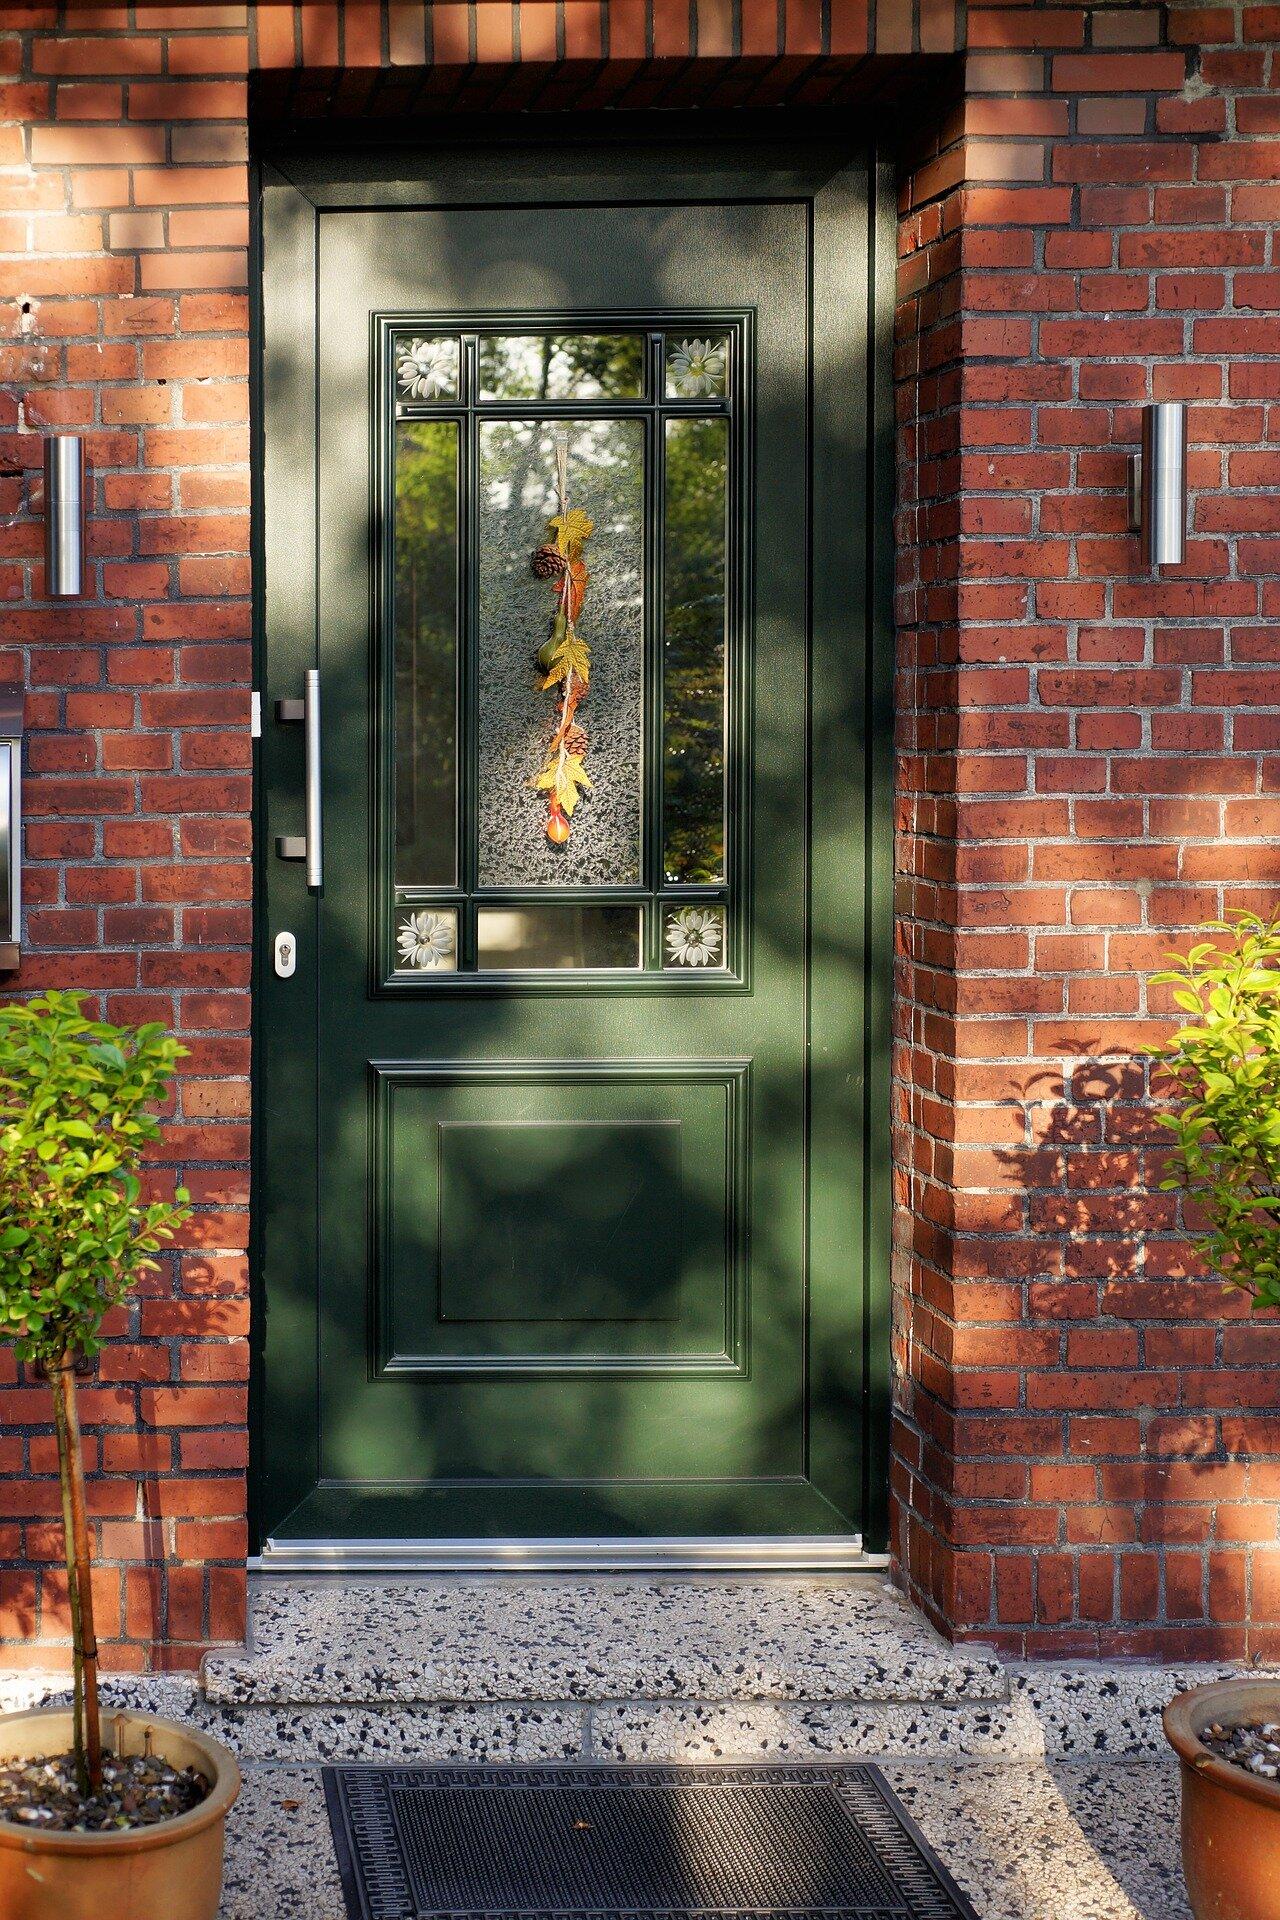 24 7 Greeley Locksmith Services Mobile Locksmiths In Greeley Co Locksmith Services Longmont